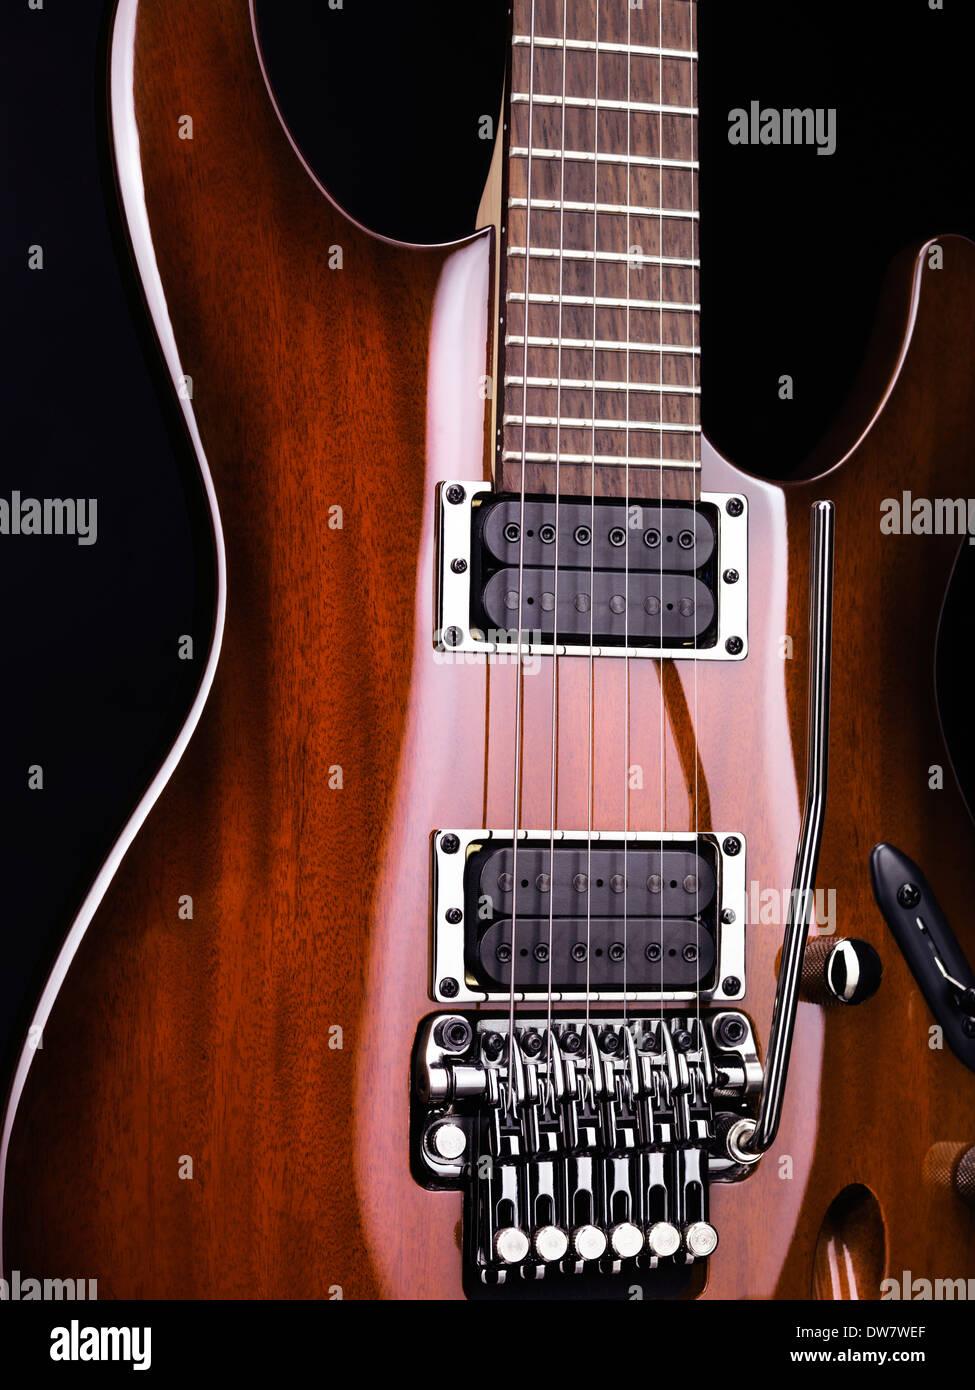 Atemberaubend Verkabelung Gitarre Galerie - Elektrische Schaltplan ...